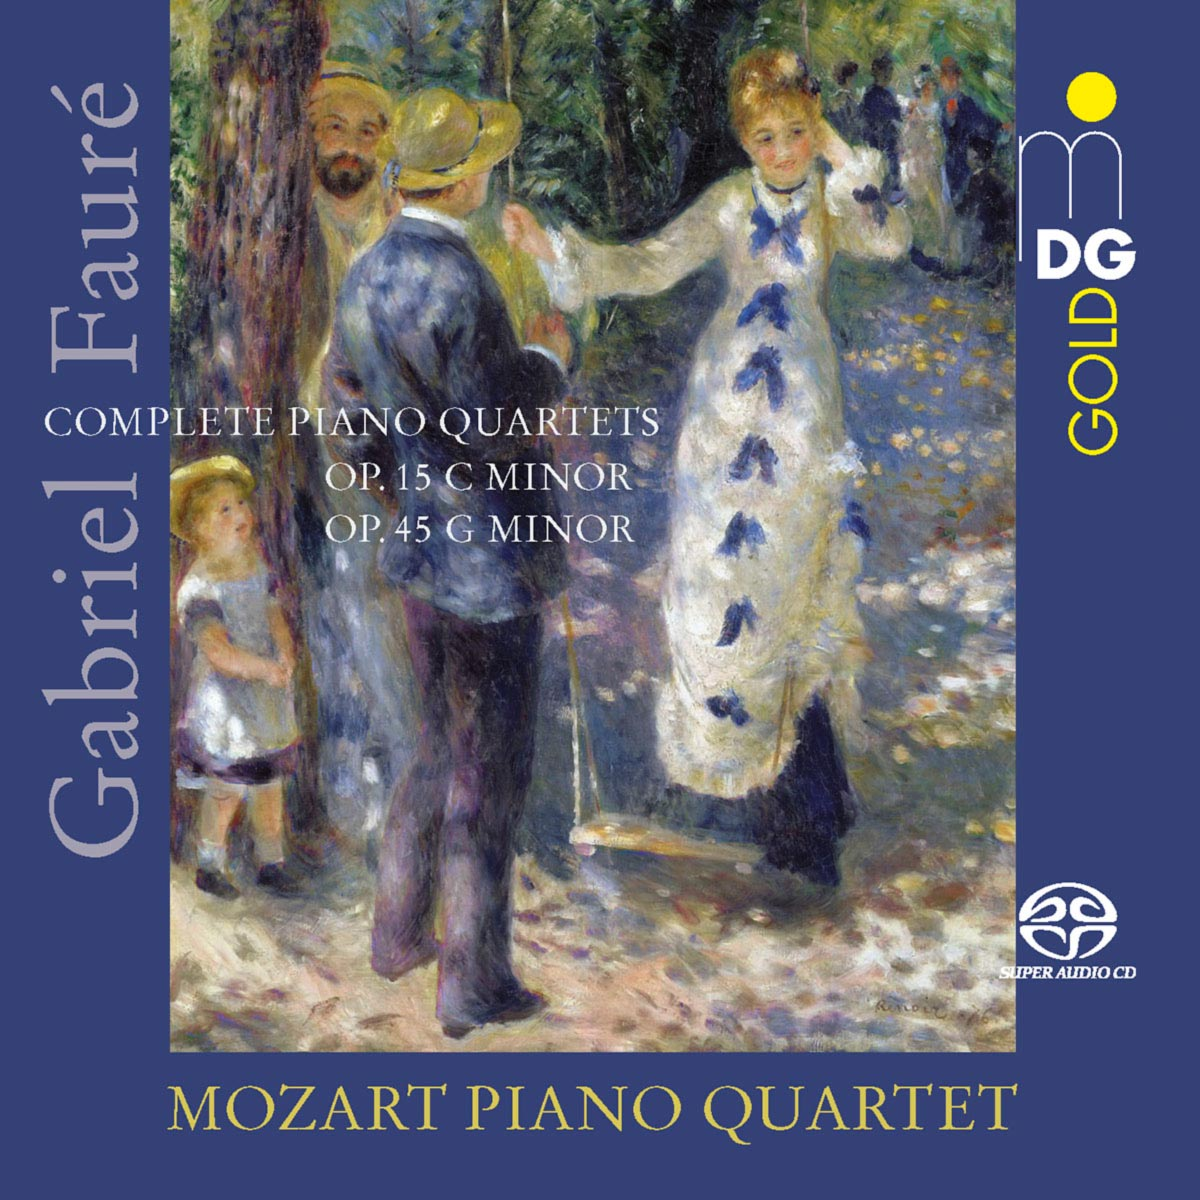 CD Mozart Piano Quartet: Gabriel Fauré